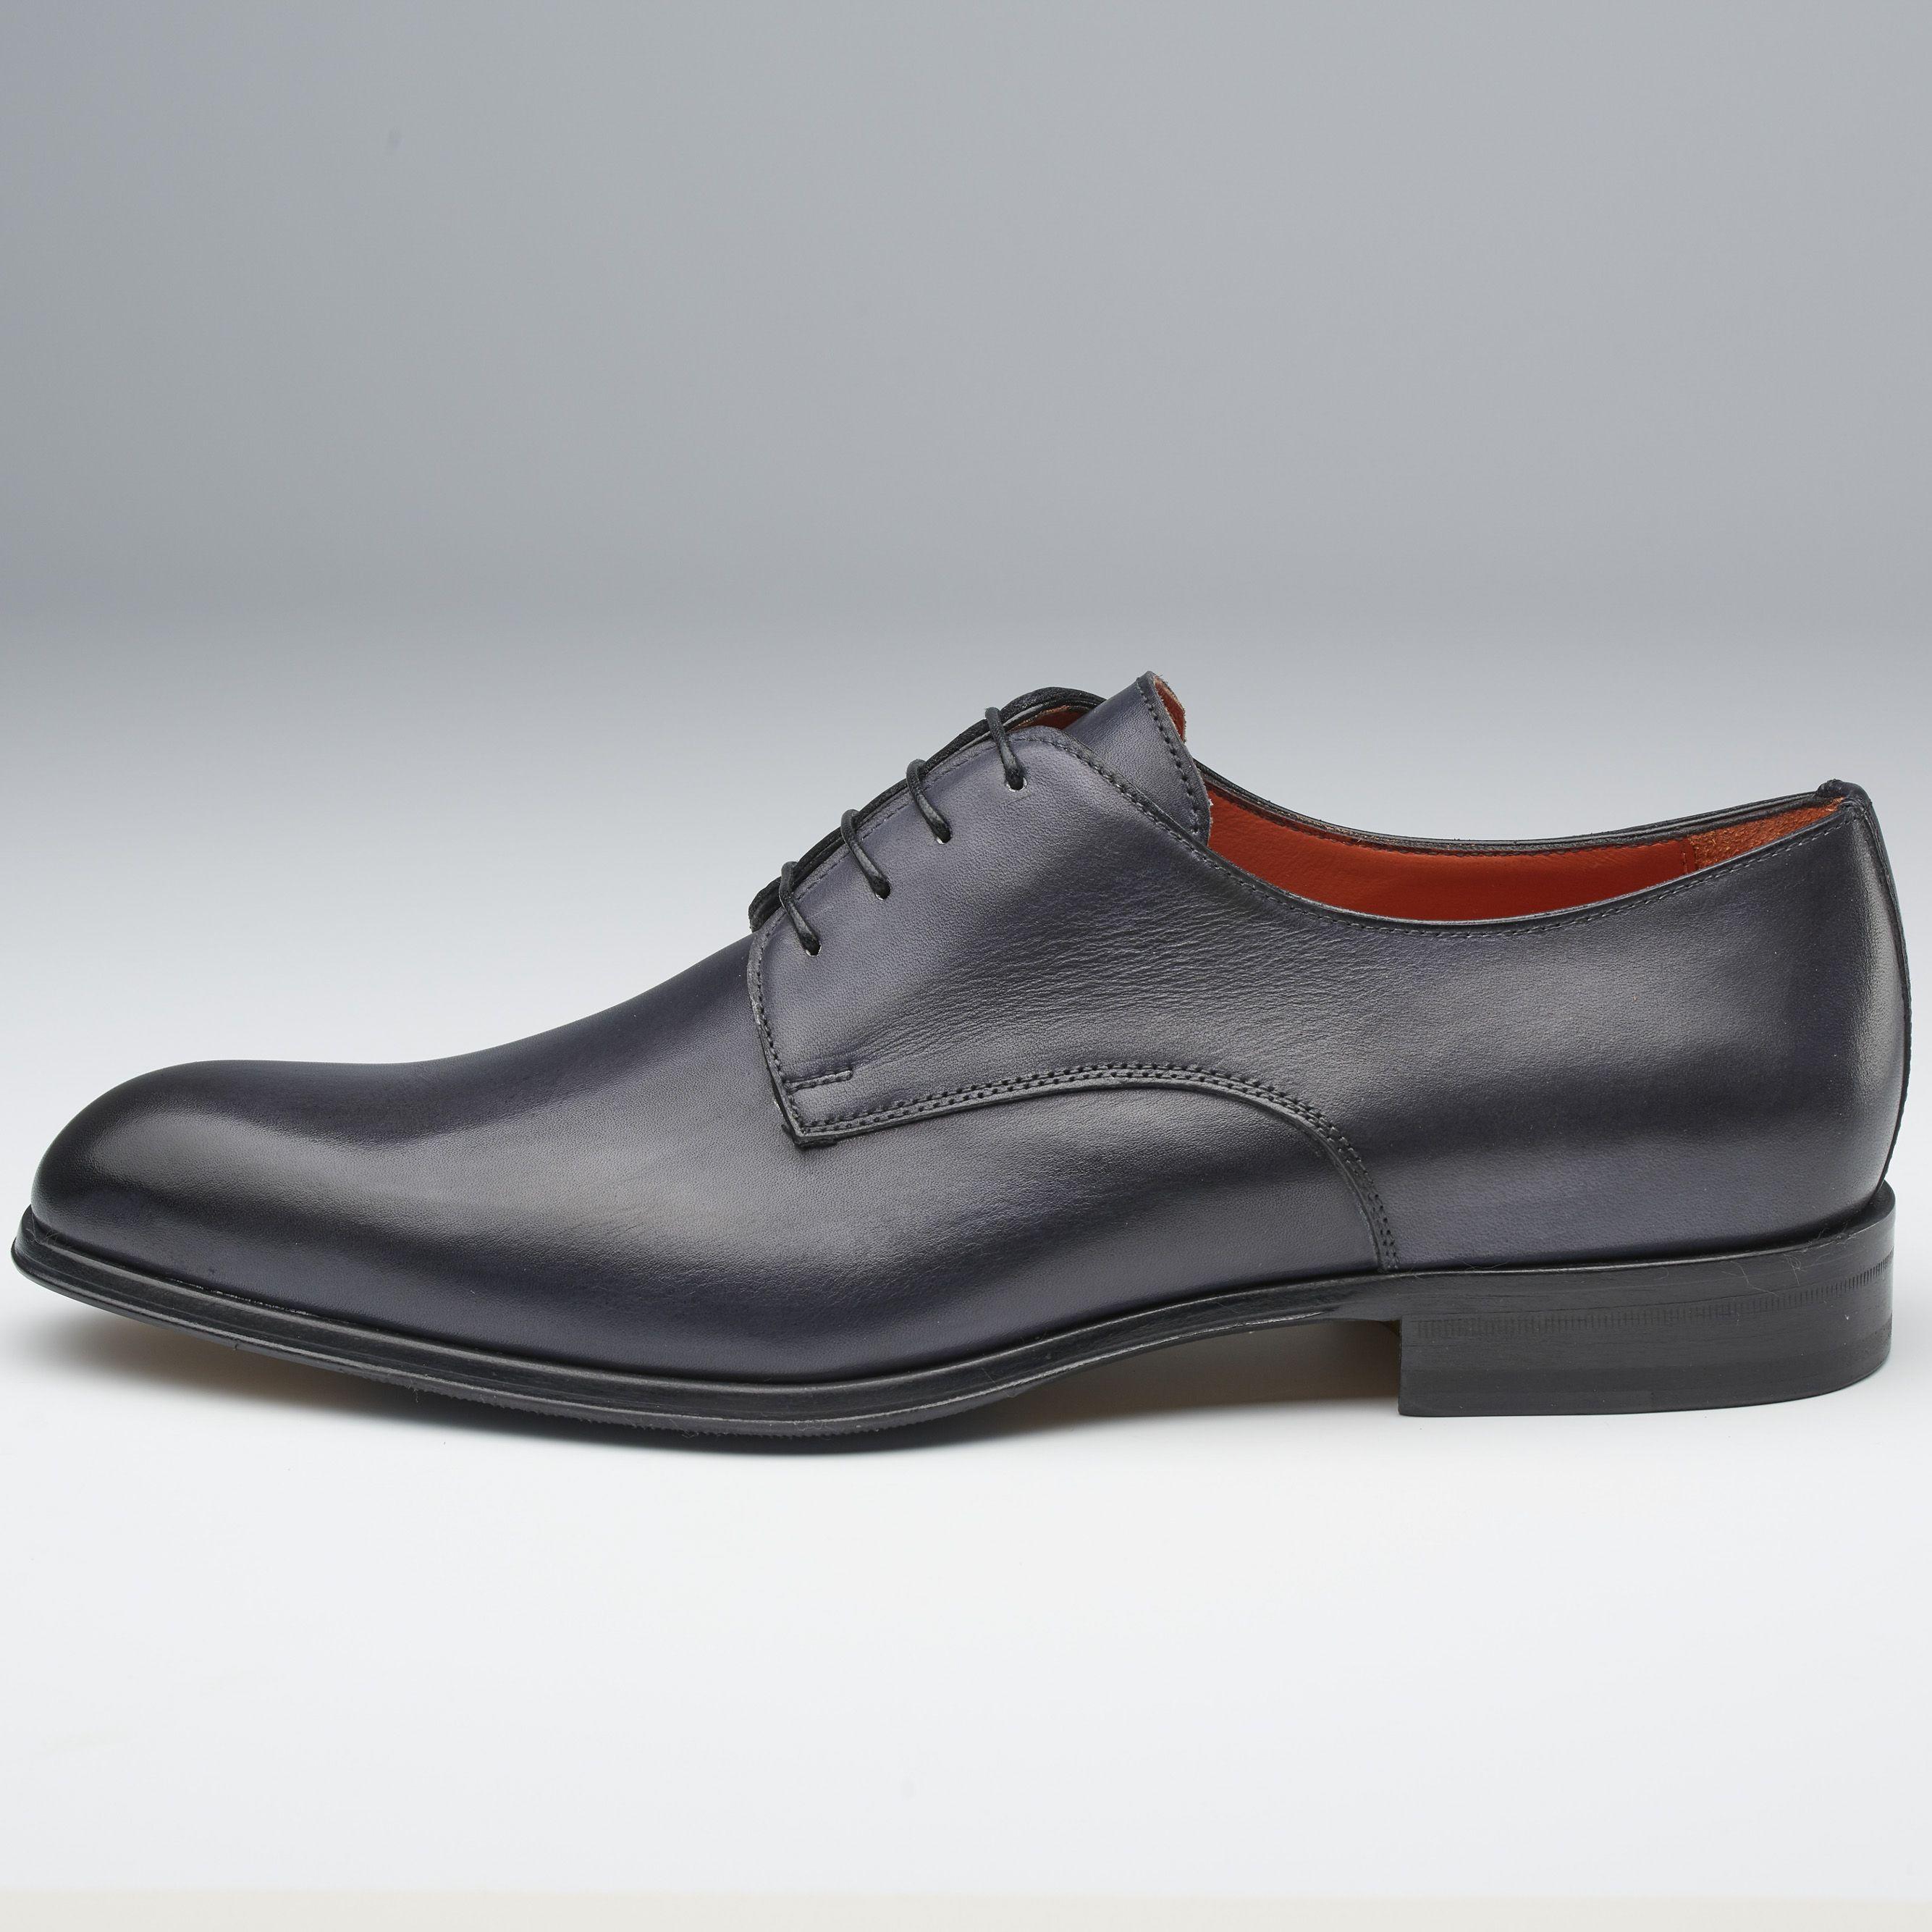 chaussures #homme #gris #elegant #costume #mariage #noir